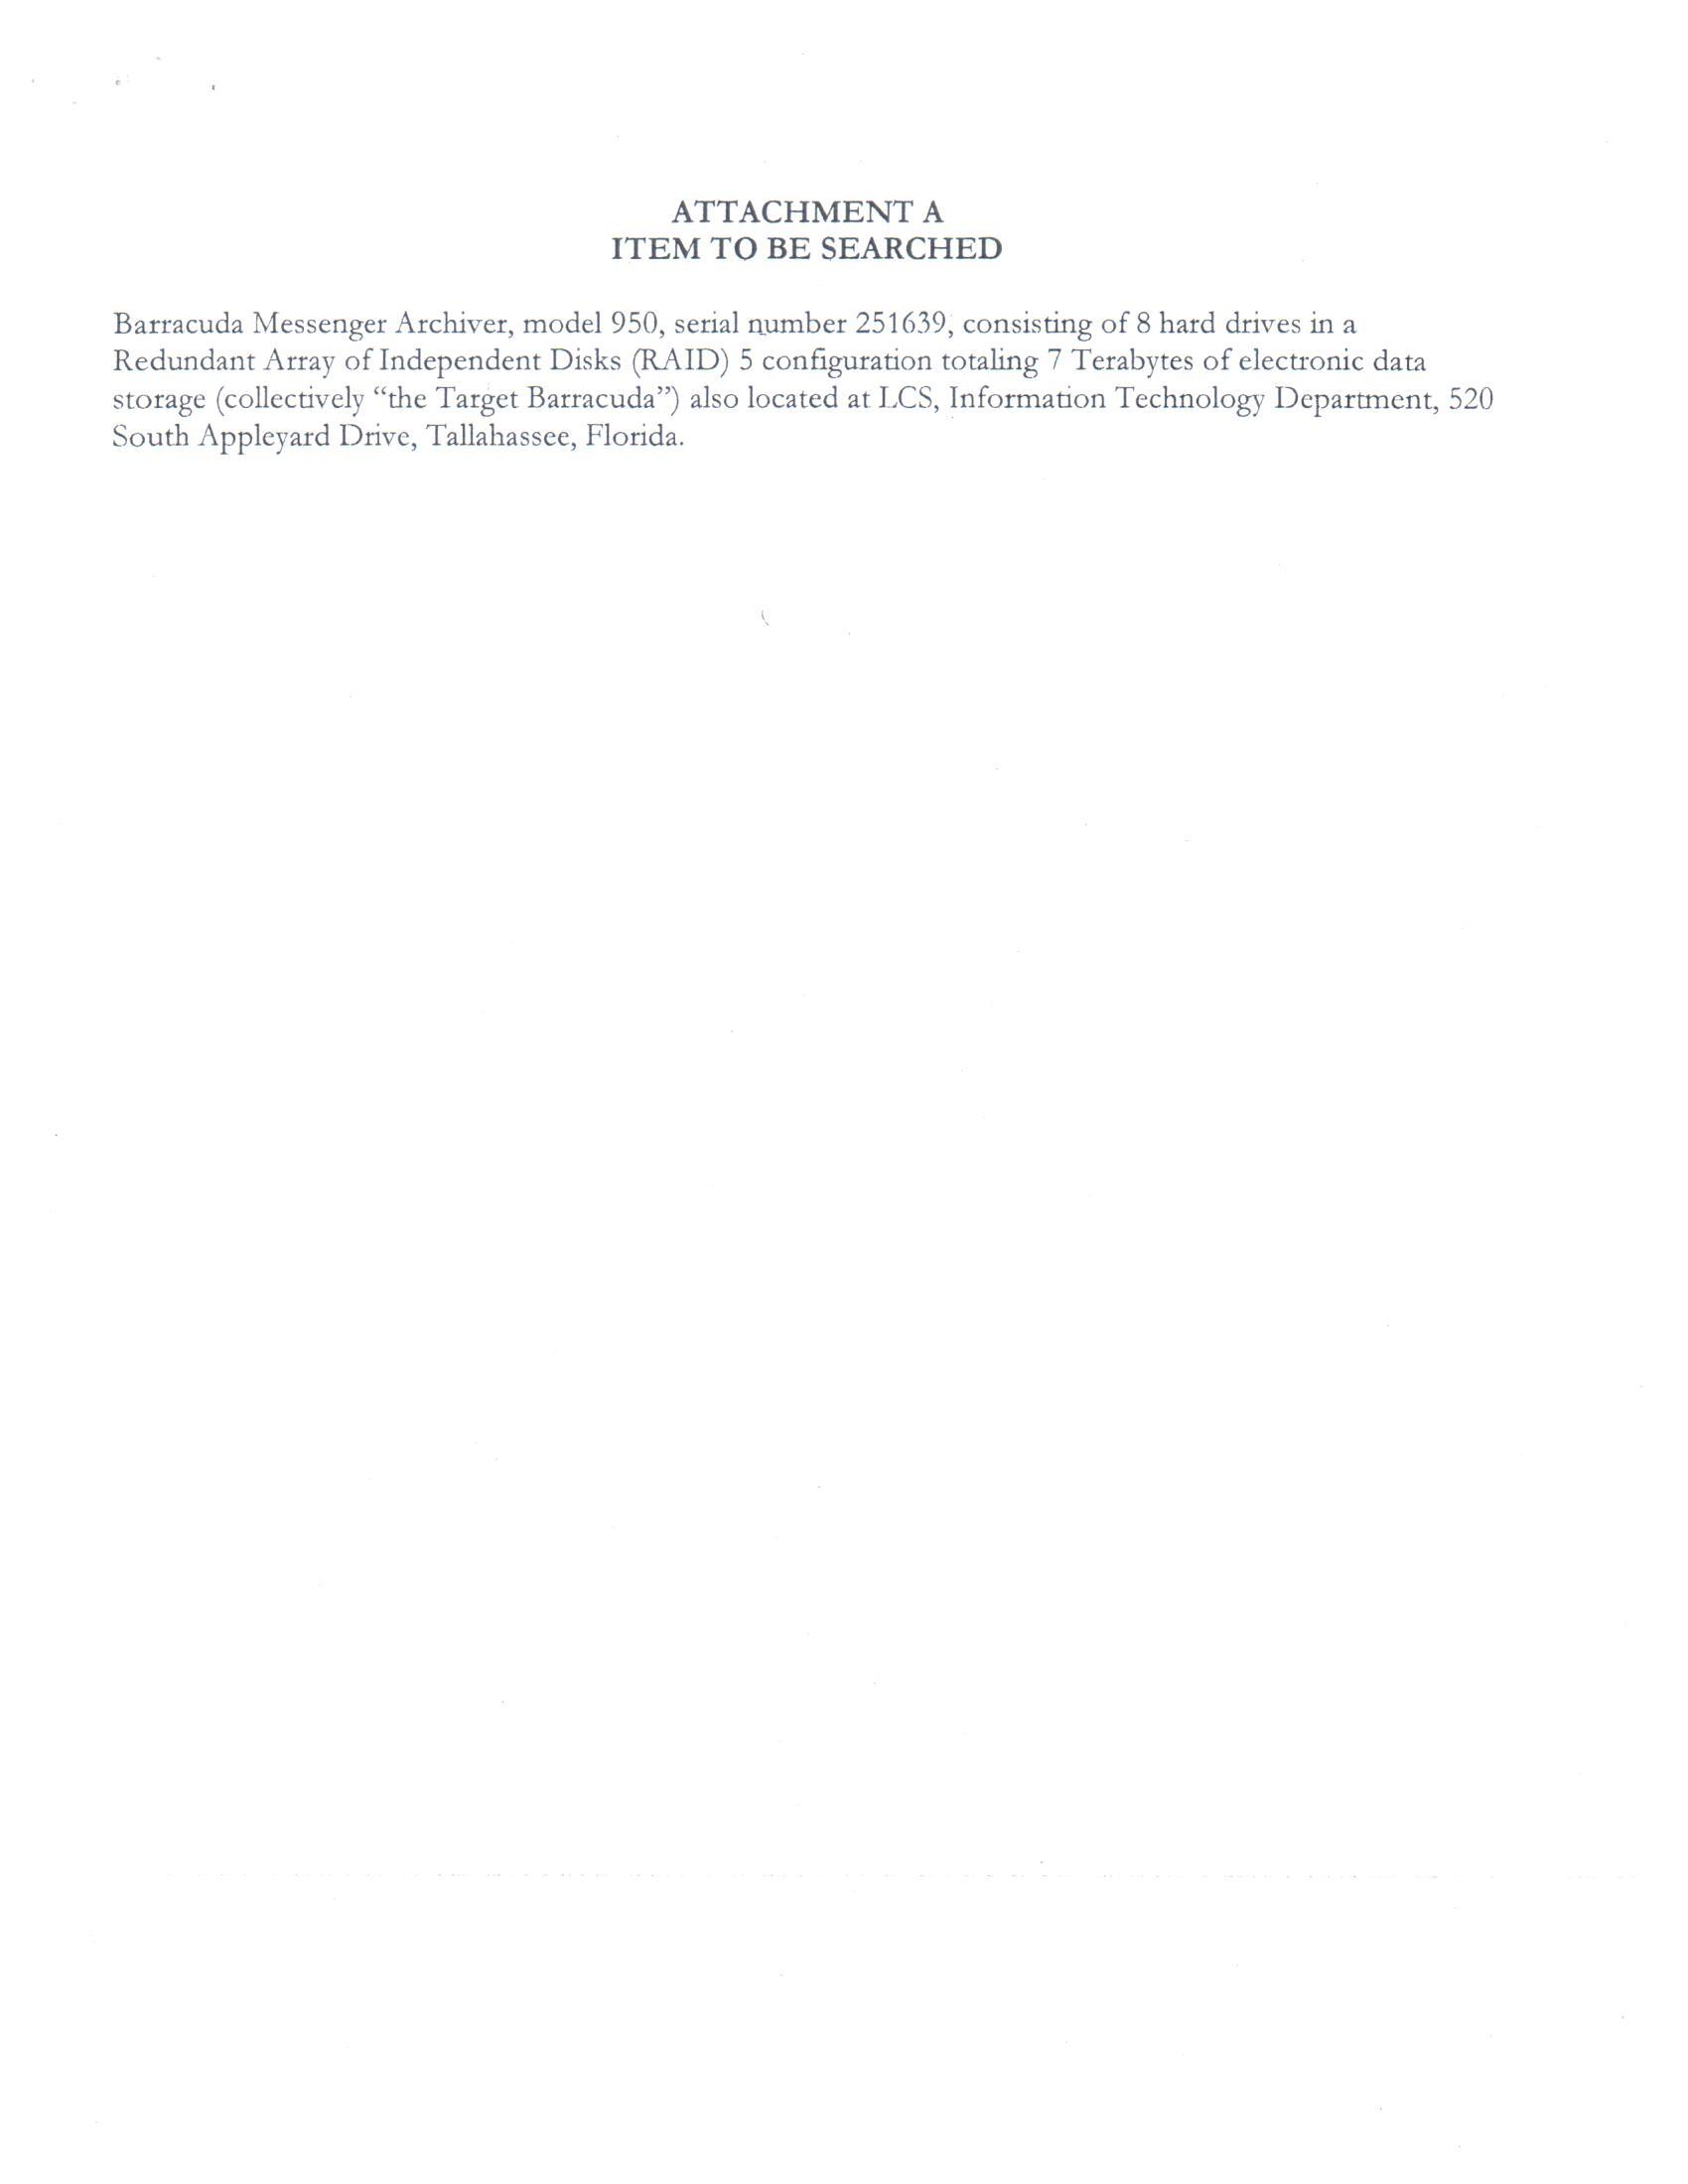 IT Search Warrant_Page_2